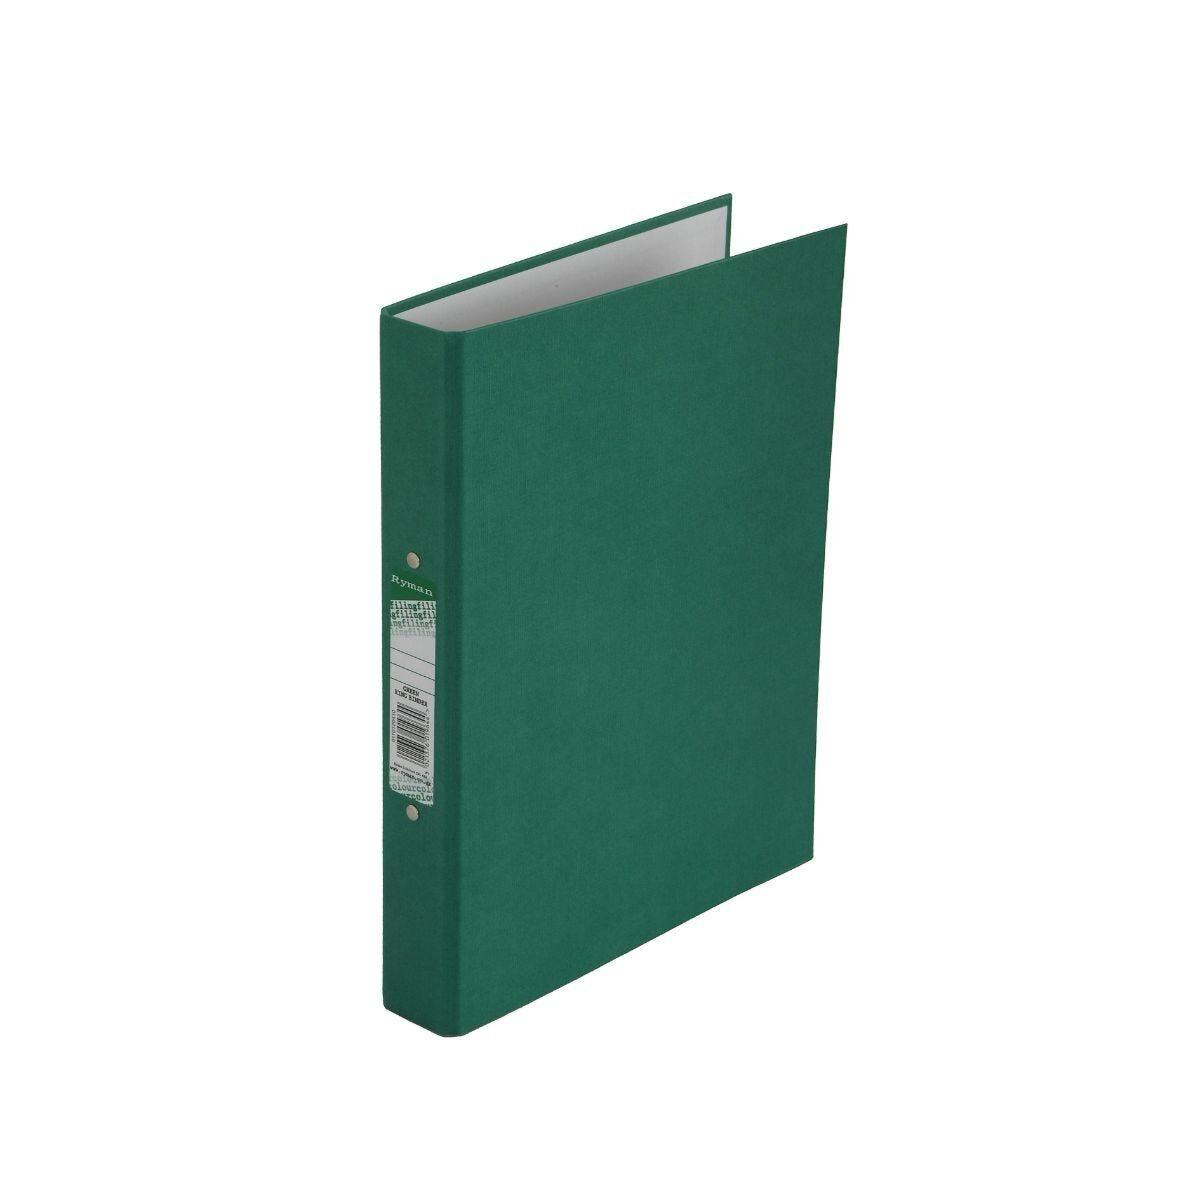 Ryman Colour Ring Binder A4 Green